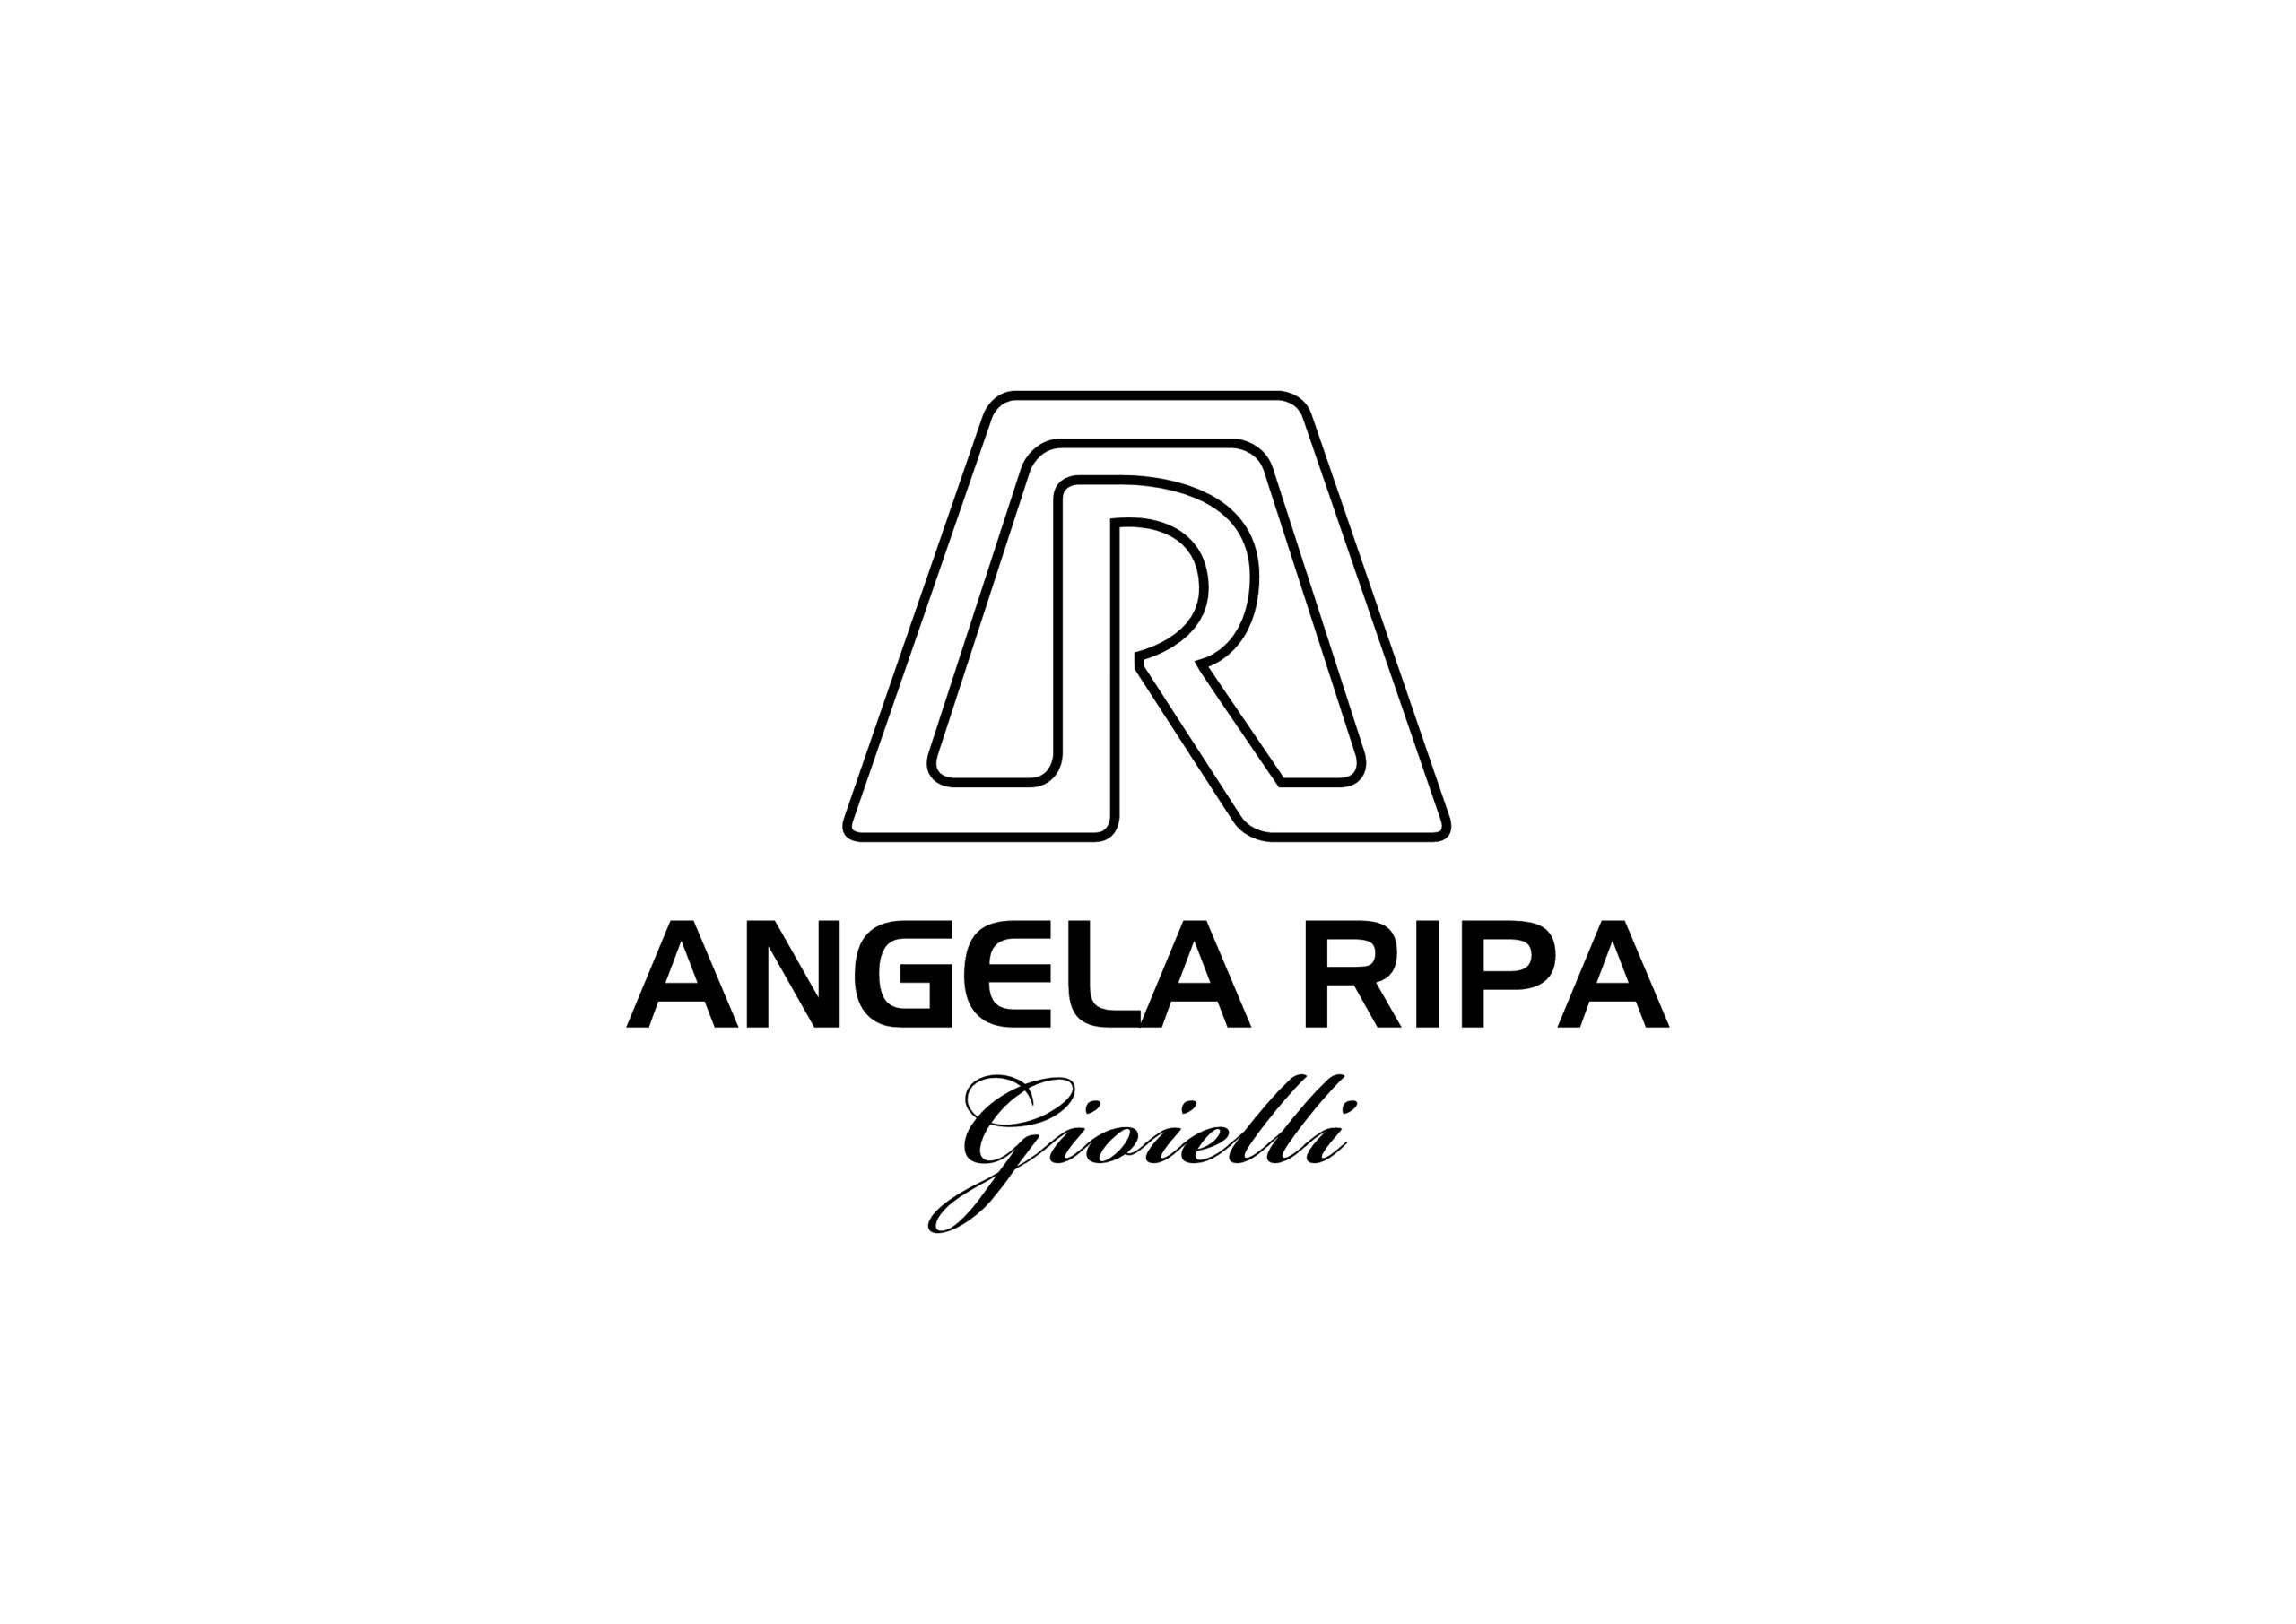 Angela Ripa